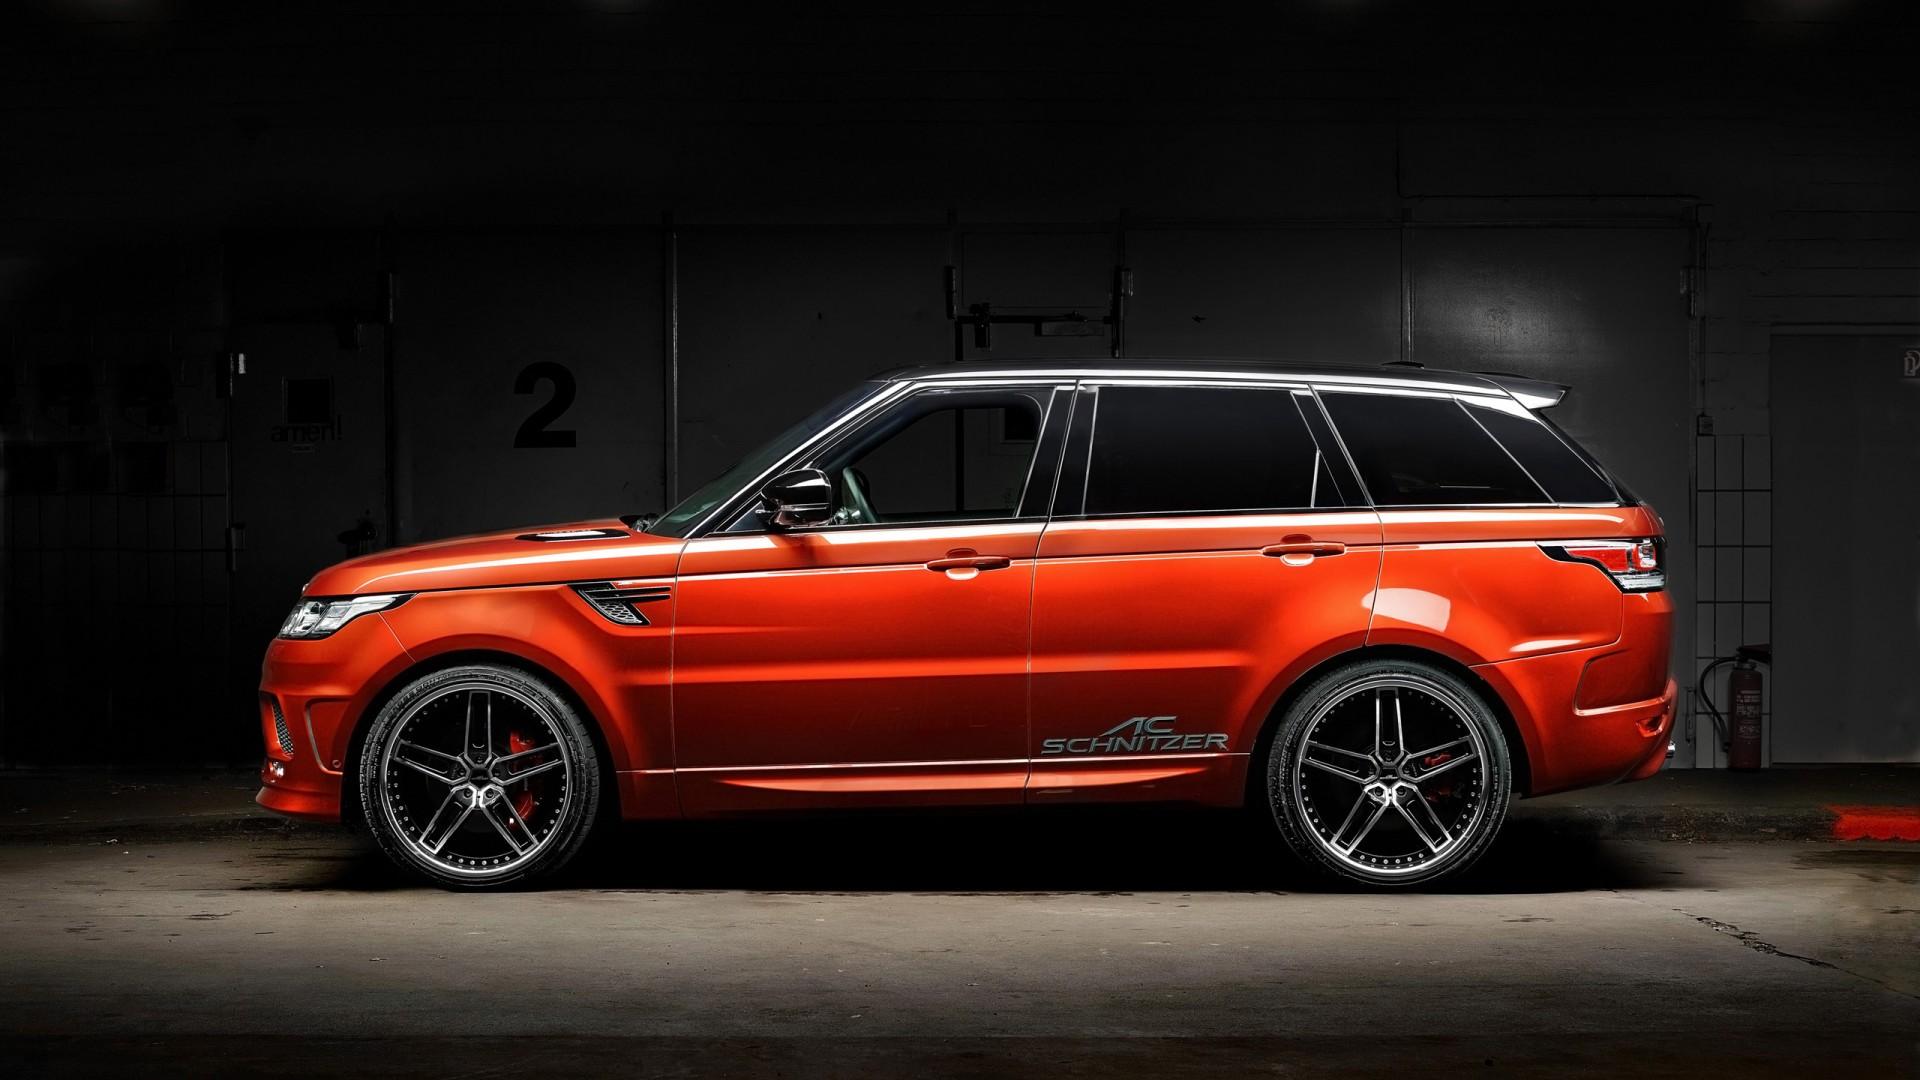 Range Rover Sport By Ac Schnitzer Wallpaper